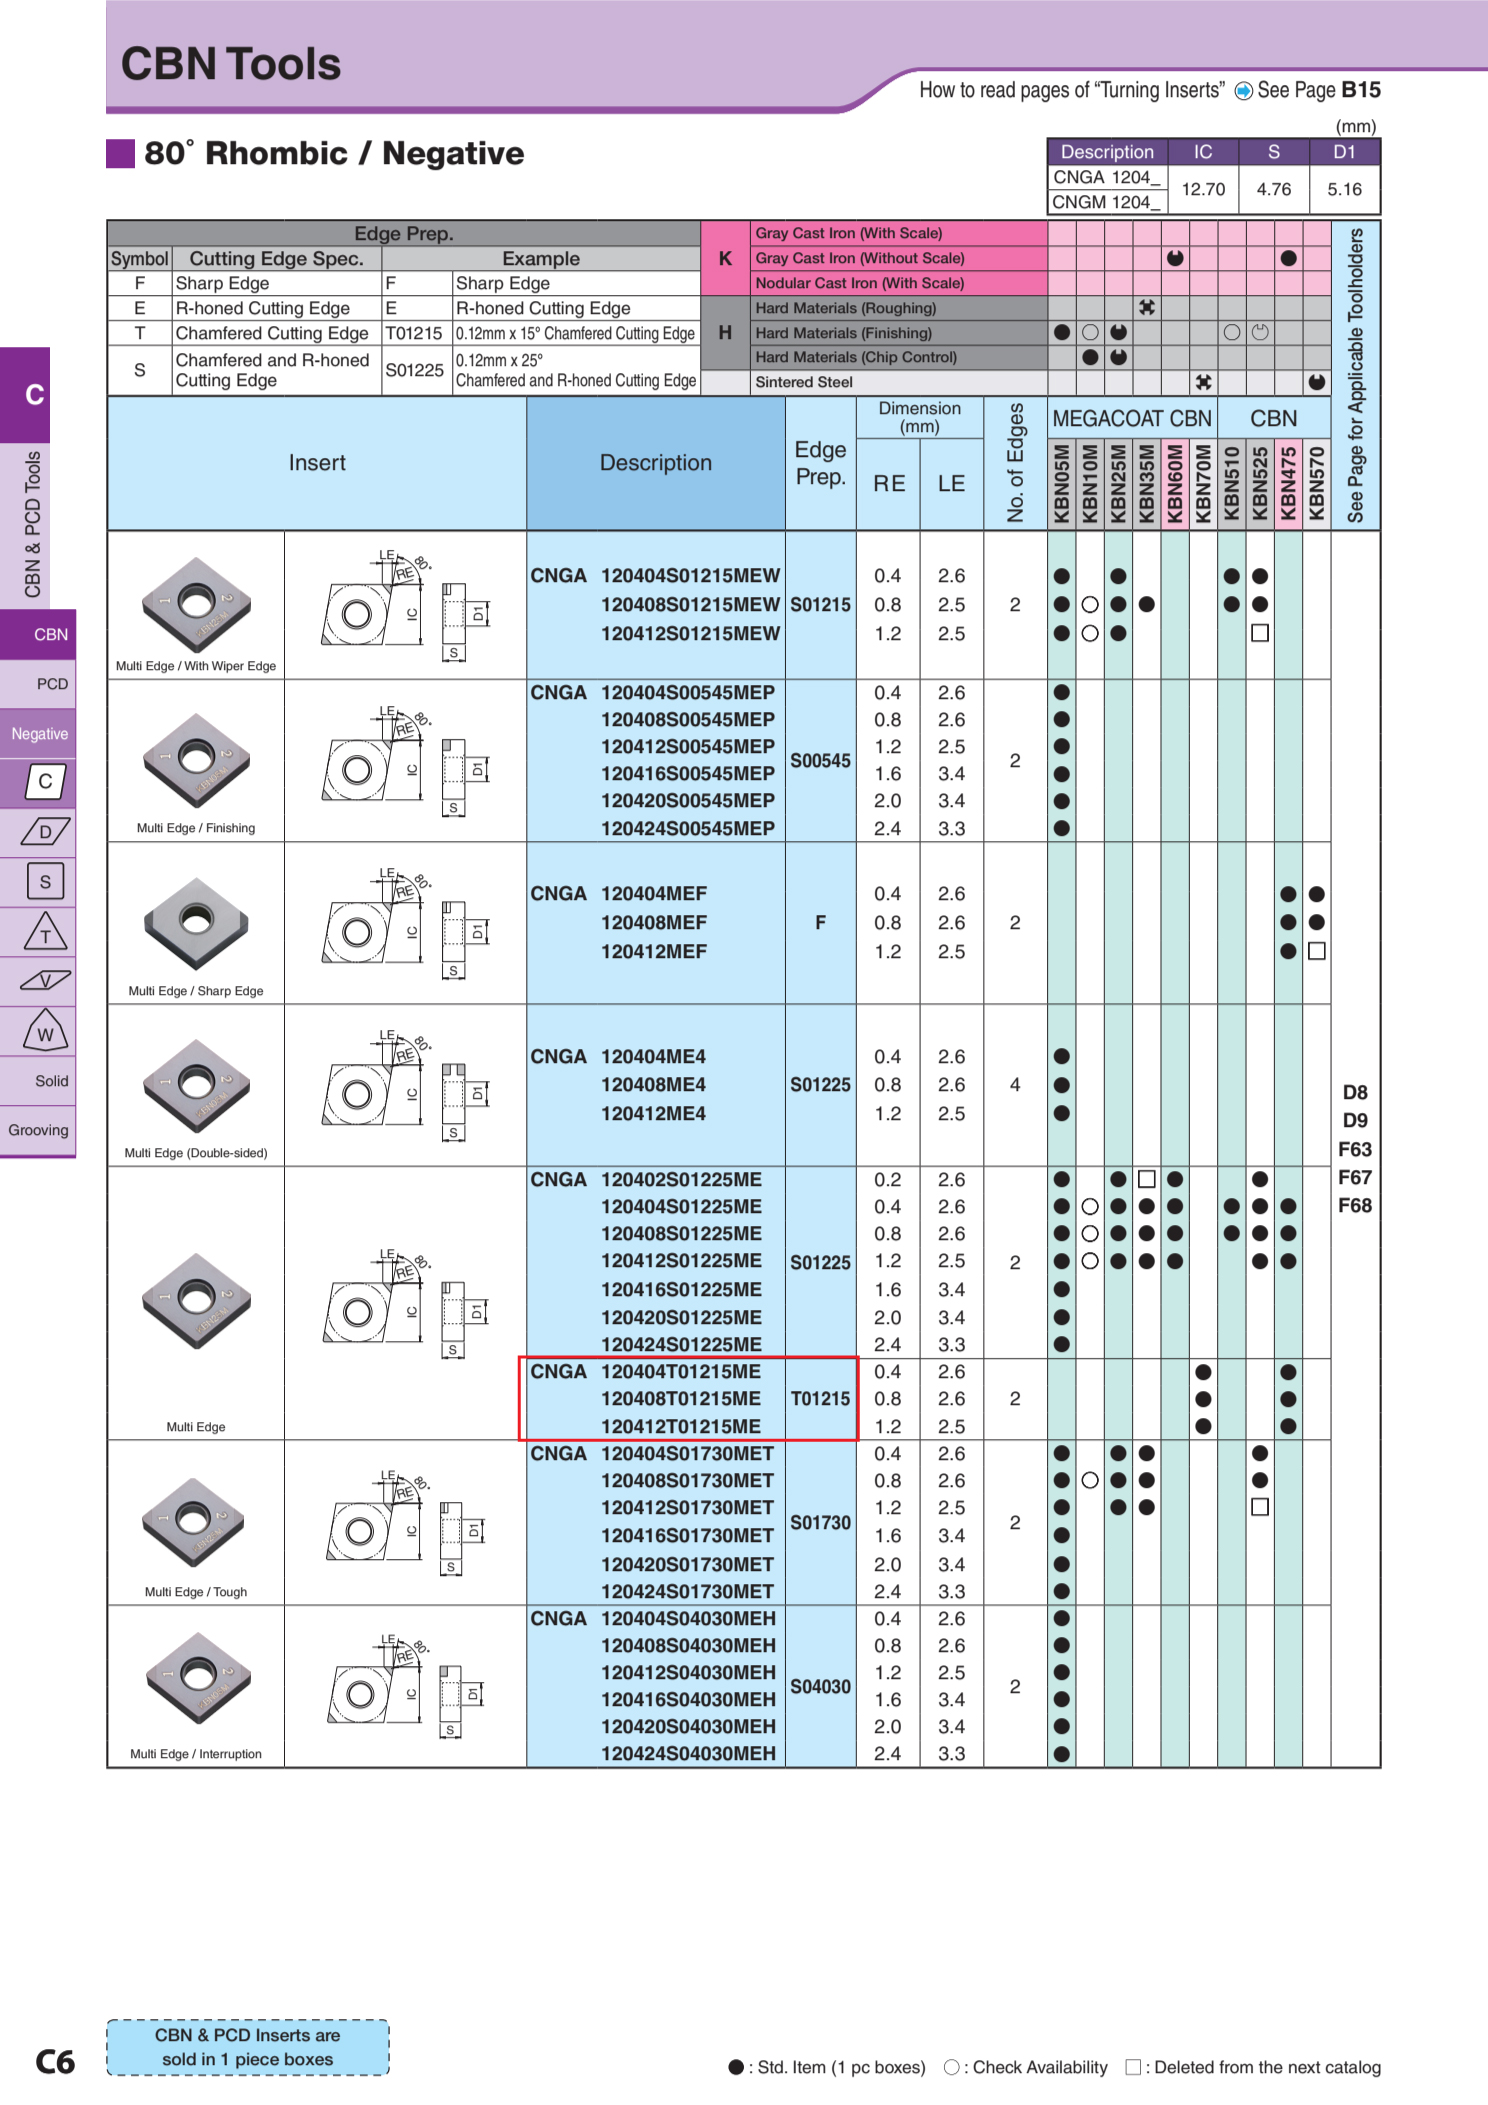 Mảnh Dao Tiện CBN Kyocera CNGA1204-T01215ME 1